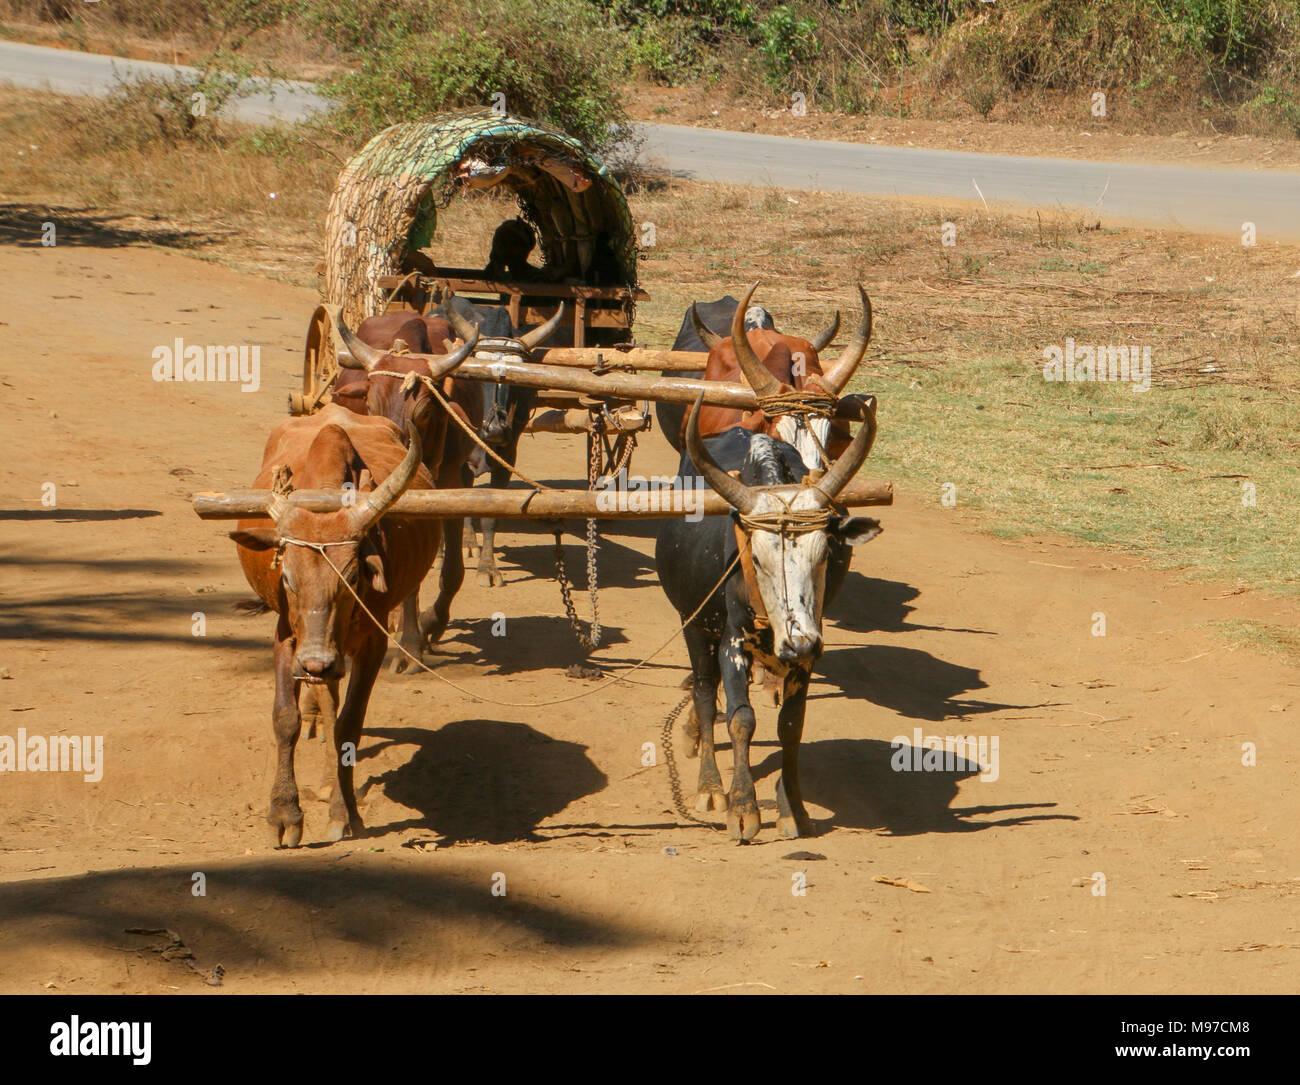 Madagascar, Anosy region, near Tolagnaro (Fort Dauphin) Oxen cart - Stock Image